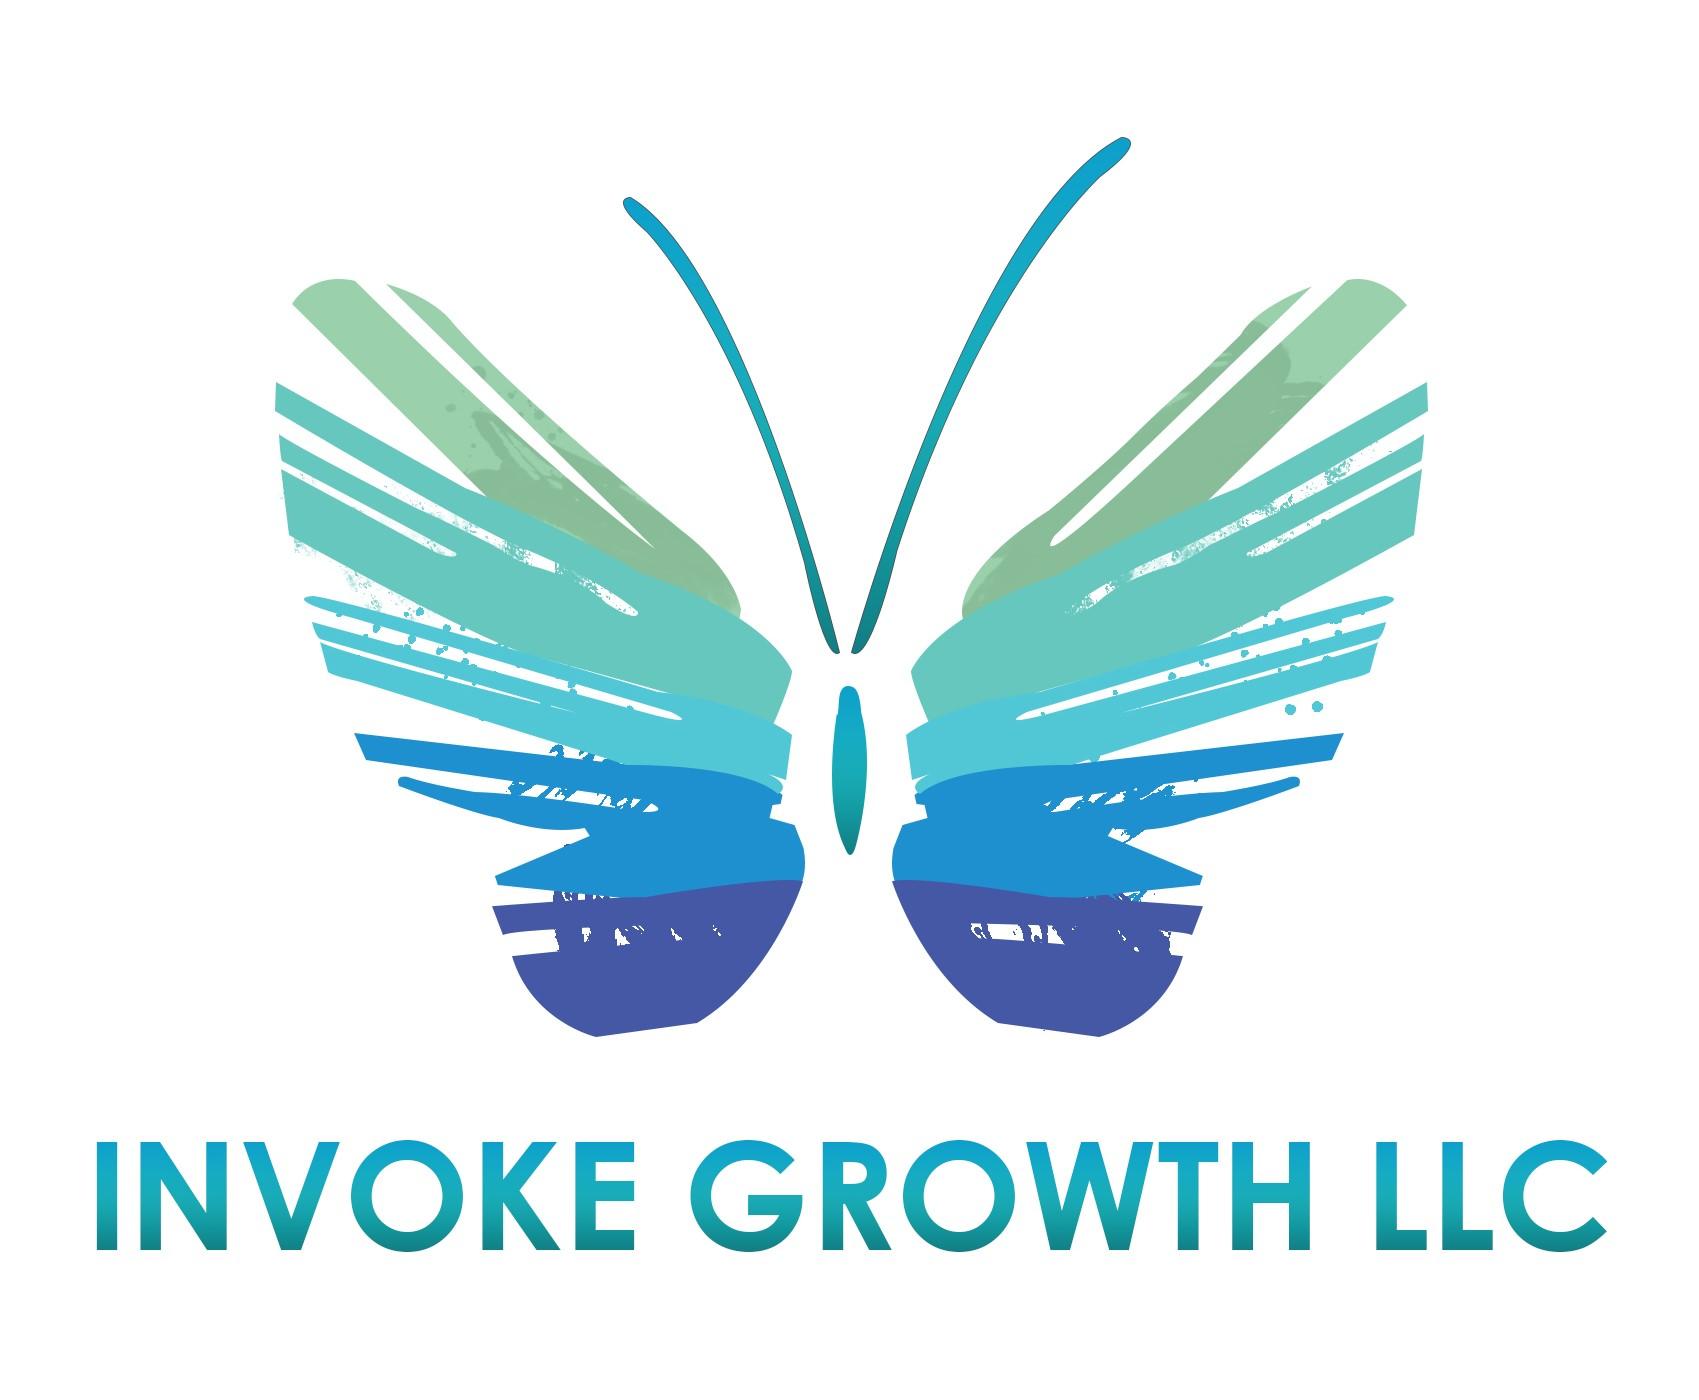 Invoke Growth LLC, Christian-based life coaching